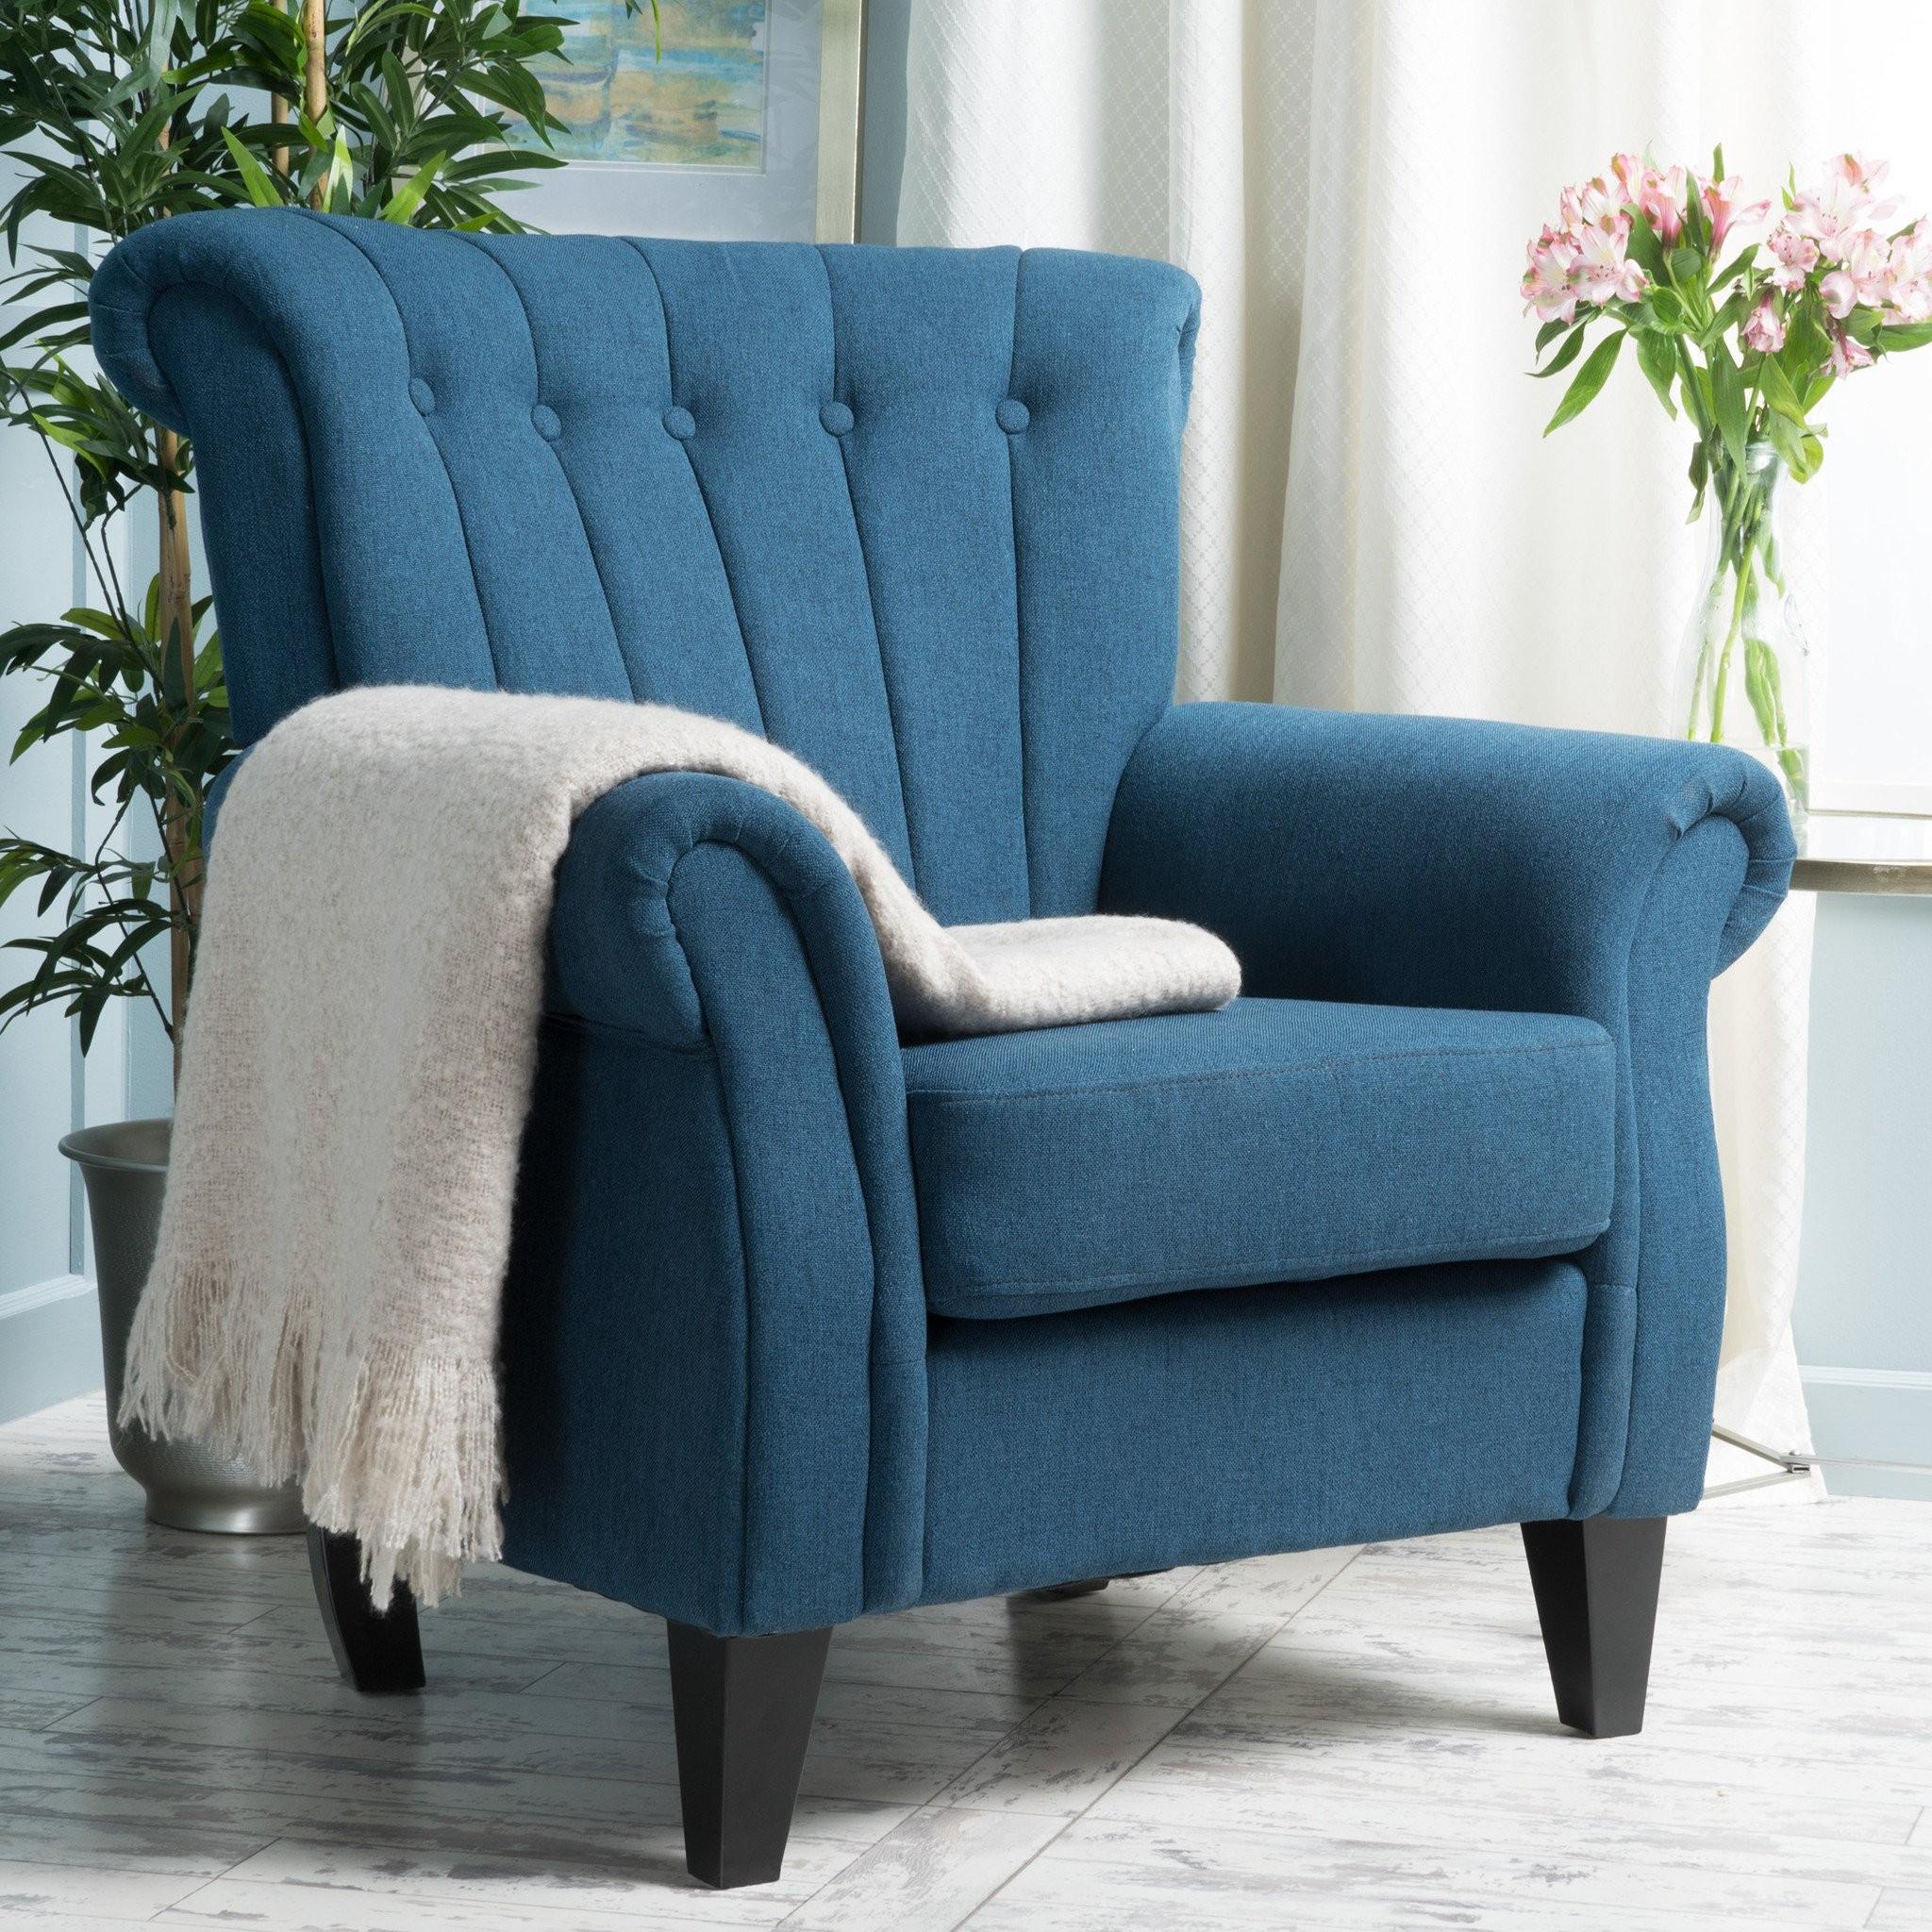 Romee Channel Backed Light Mocha Fabric Armchair